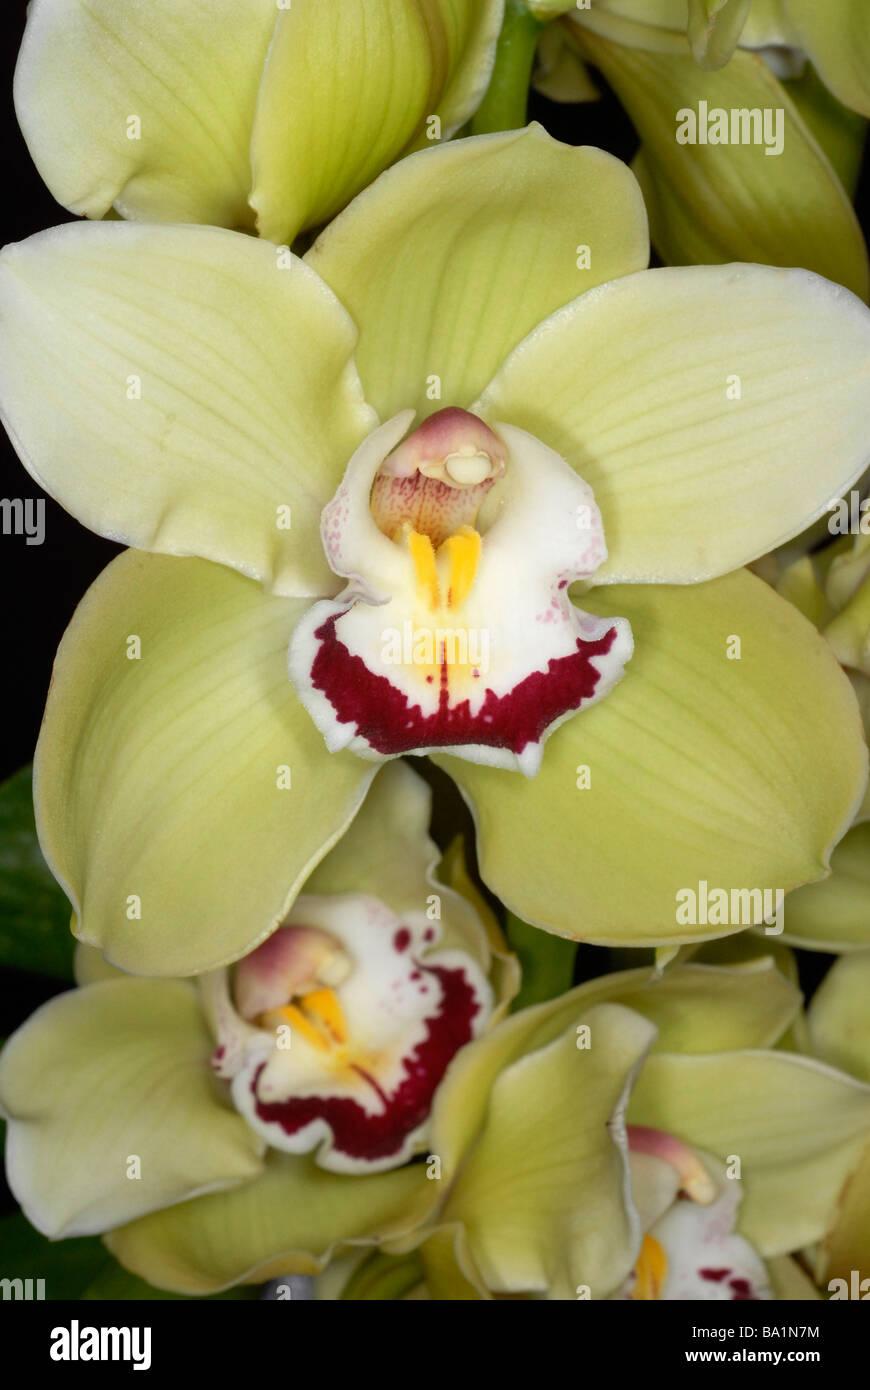 close up of center of orchid Cymbidium - Stock Image